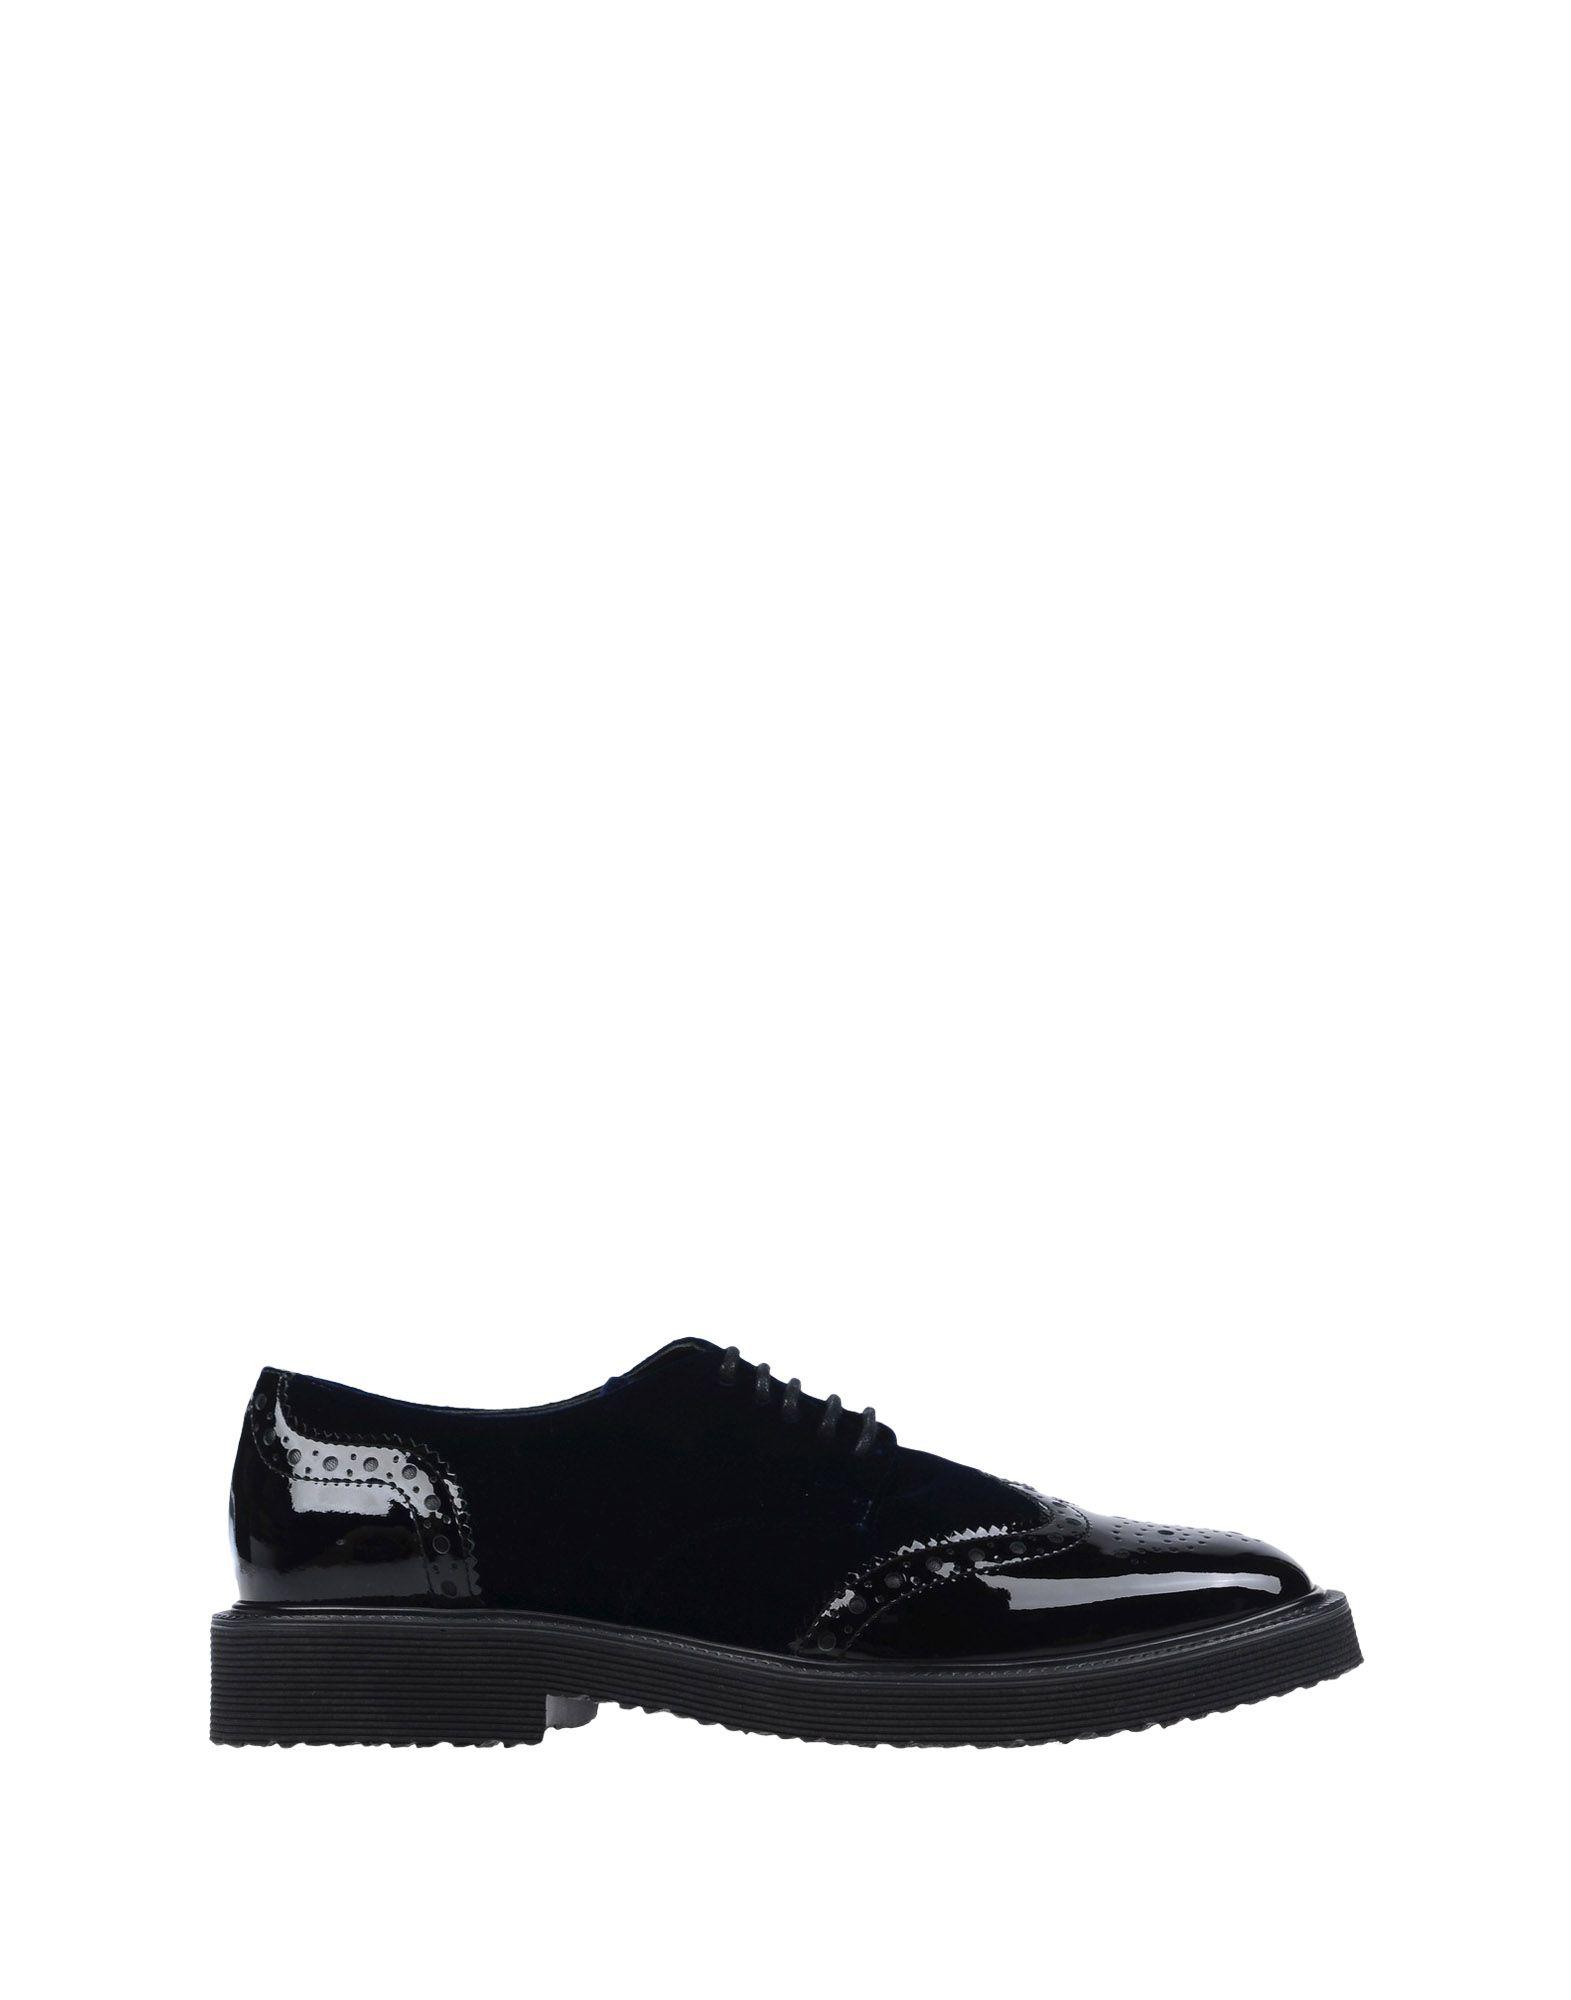 Giuseppe Zanotti Schnürschuhe Herren beliebte  11249305DC Gute Qualität beliebte Herren Schuhe ca9927